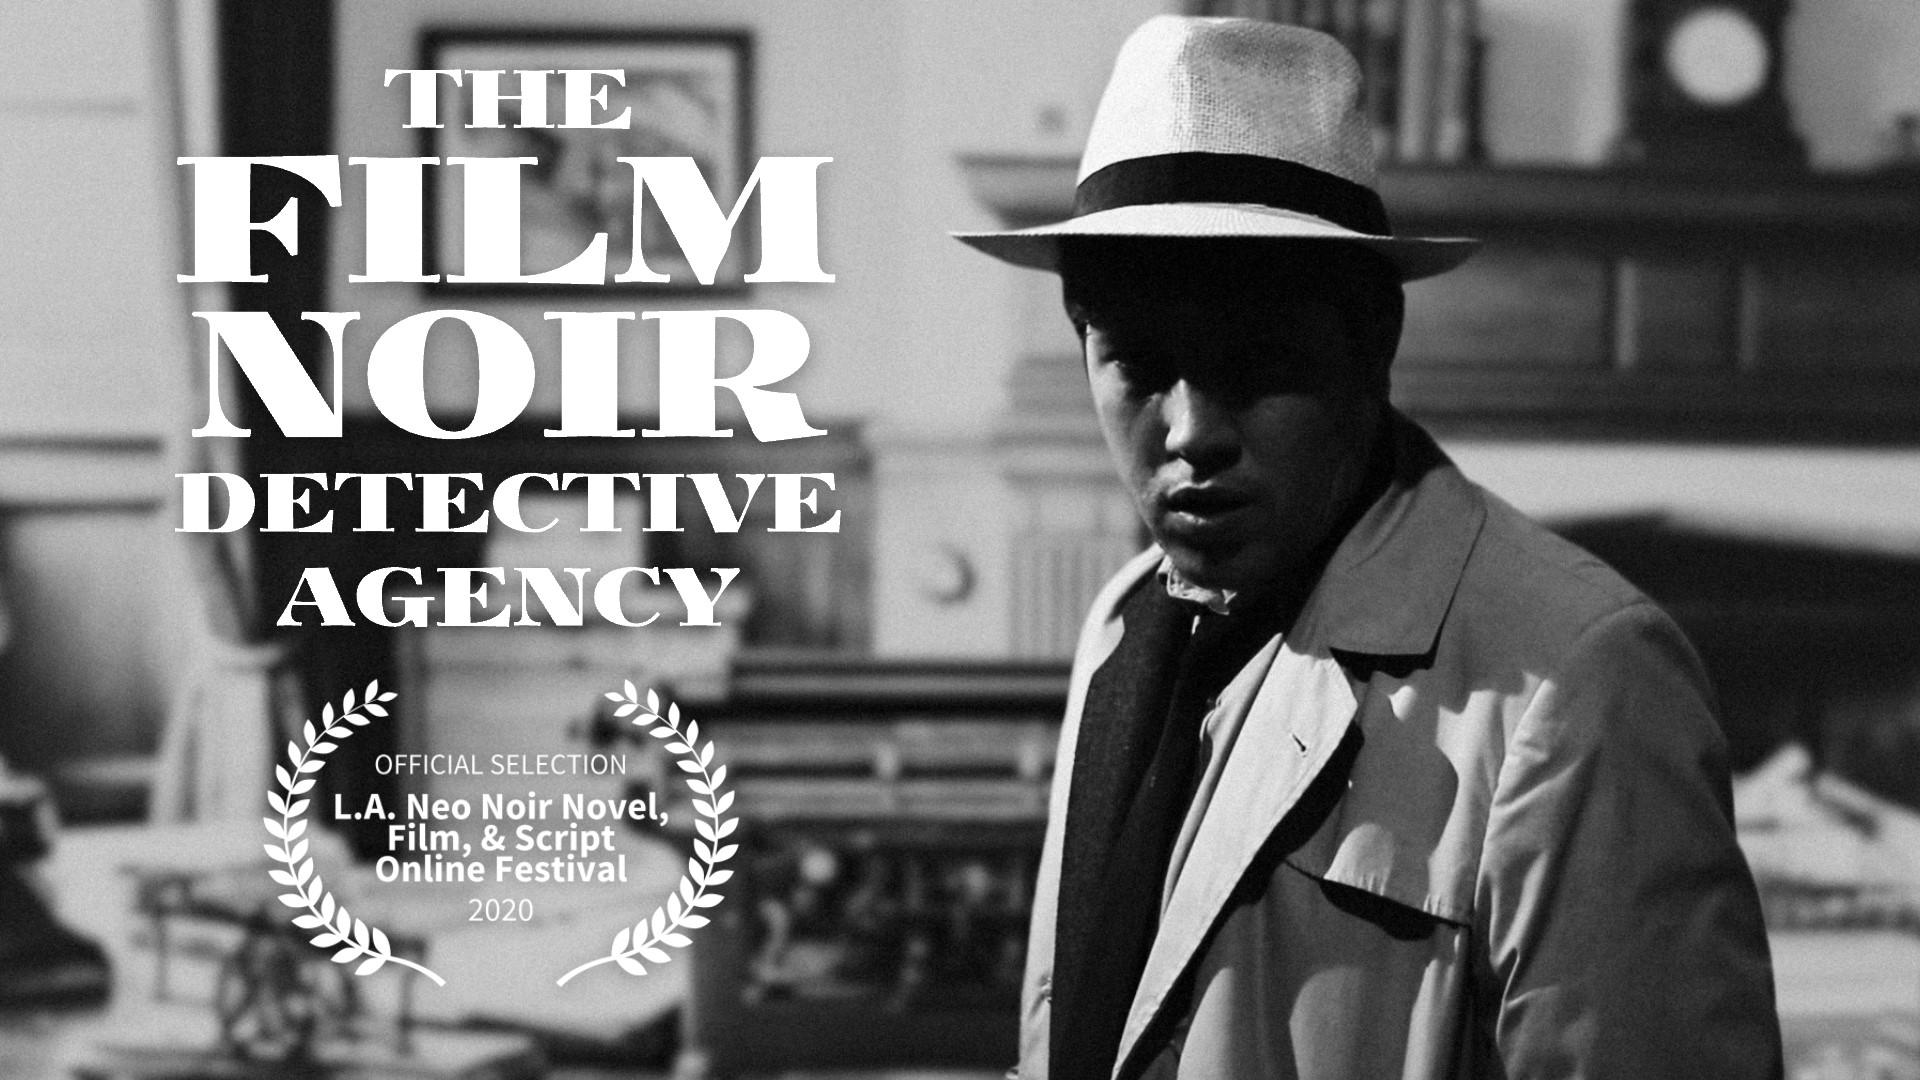 The Film Noir Detective Agency